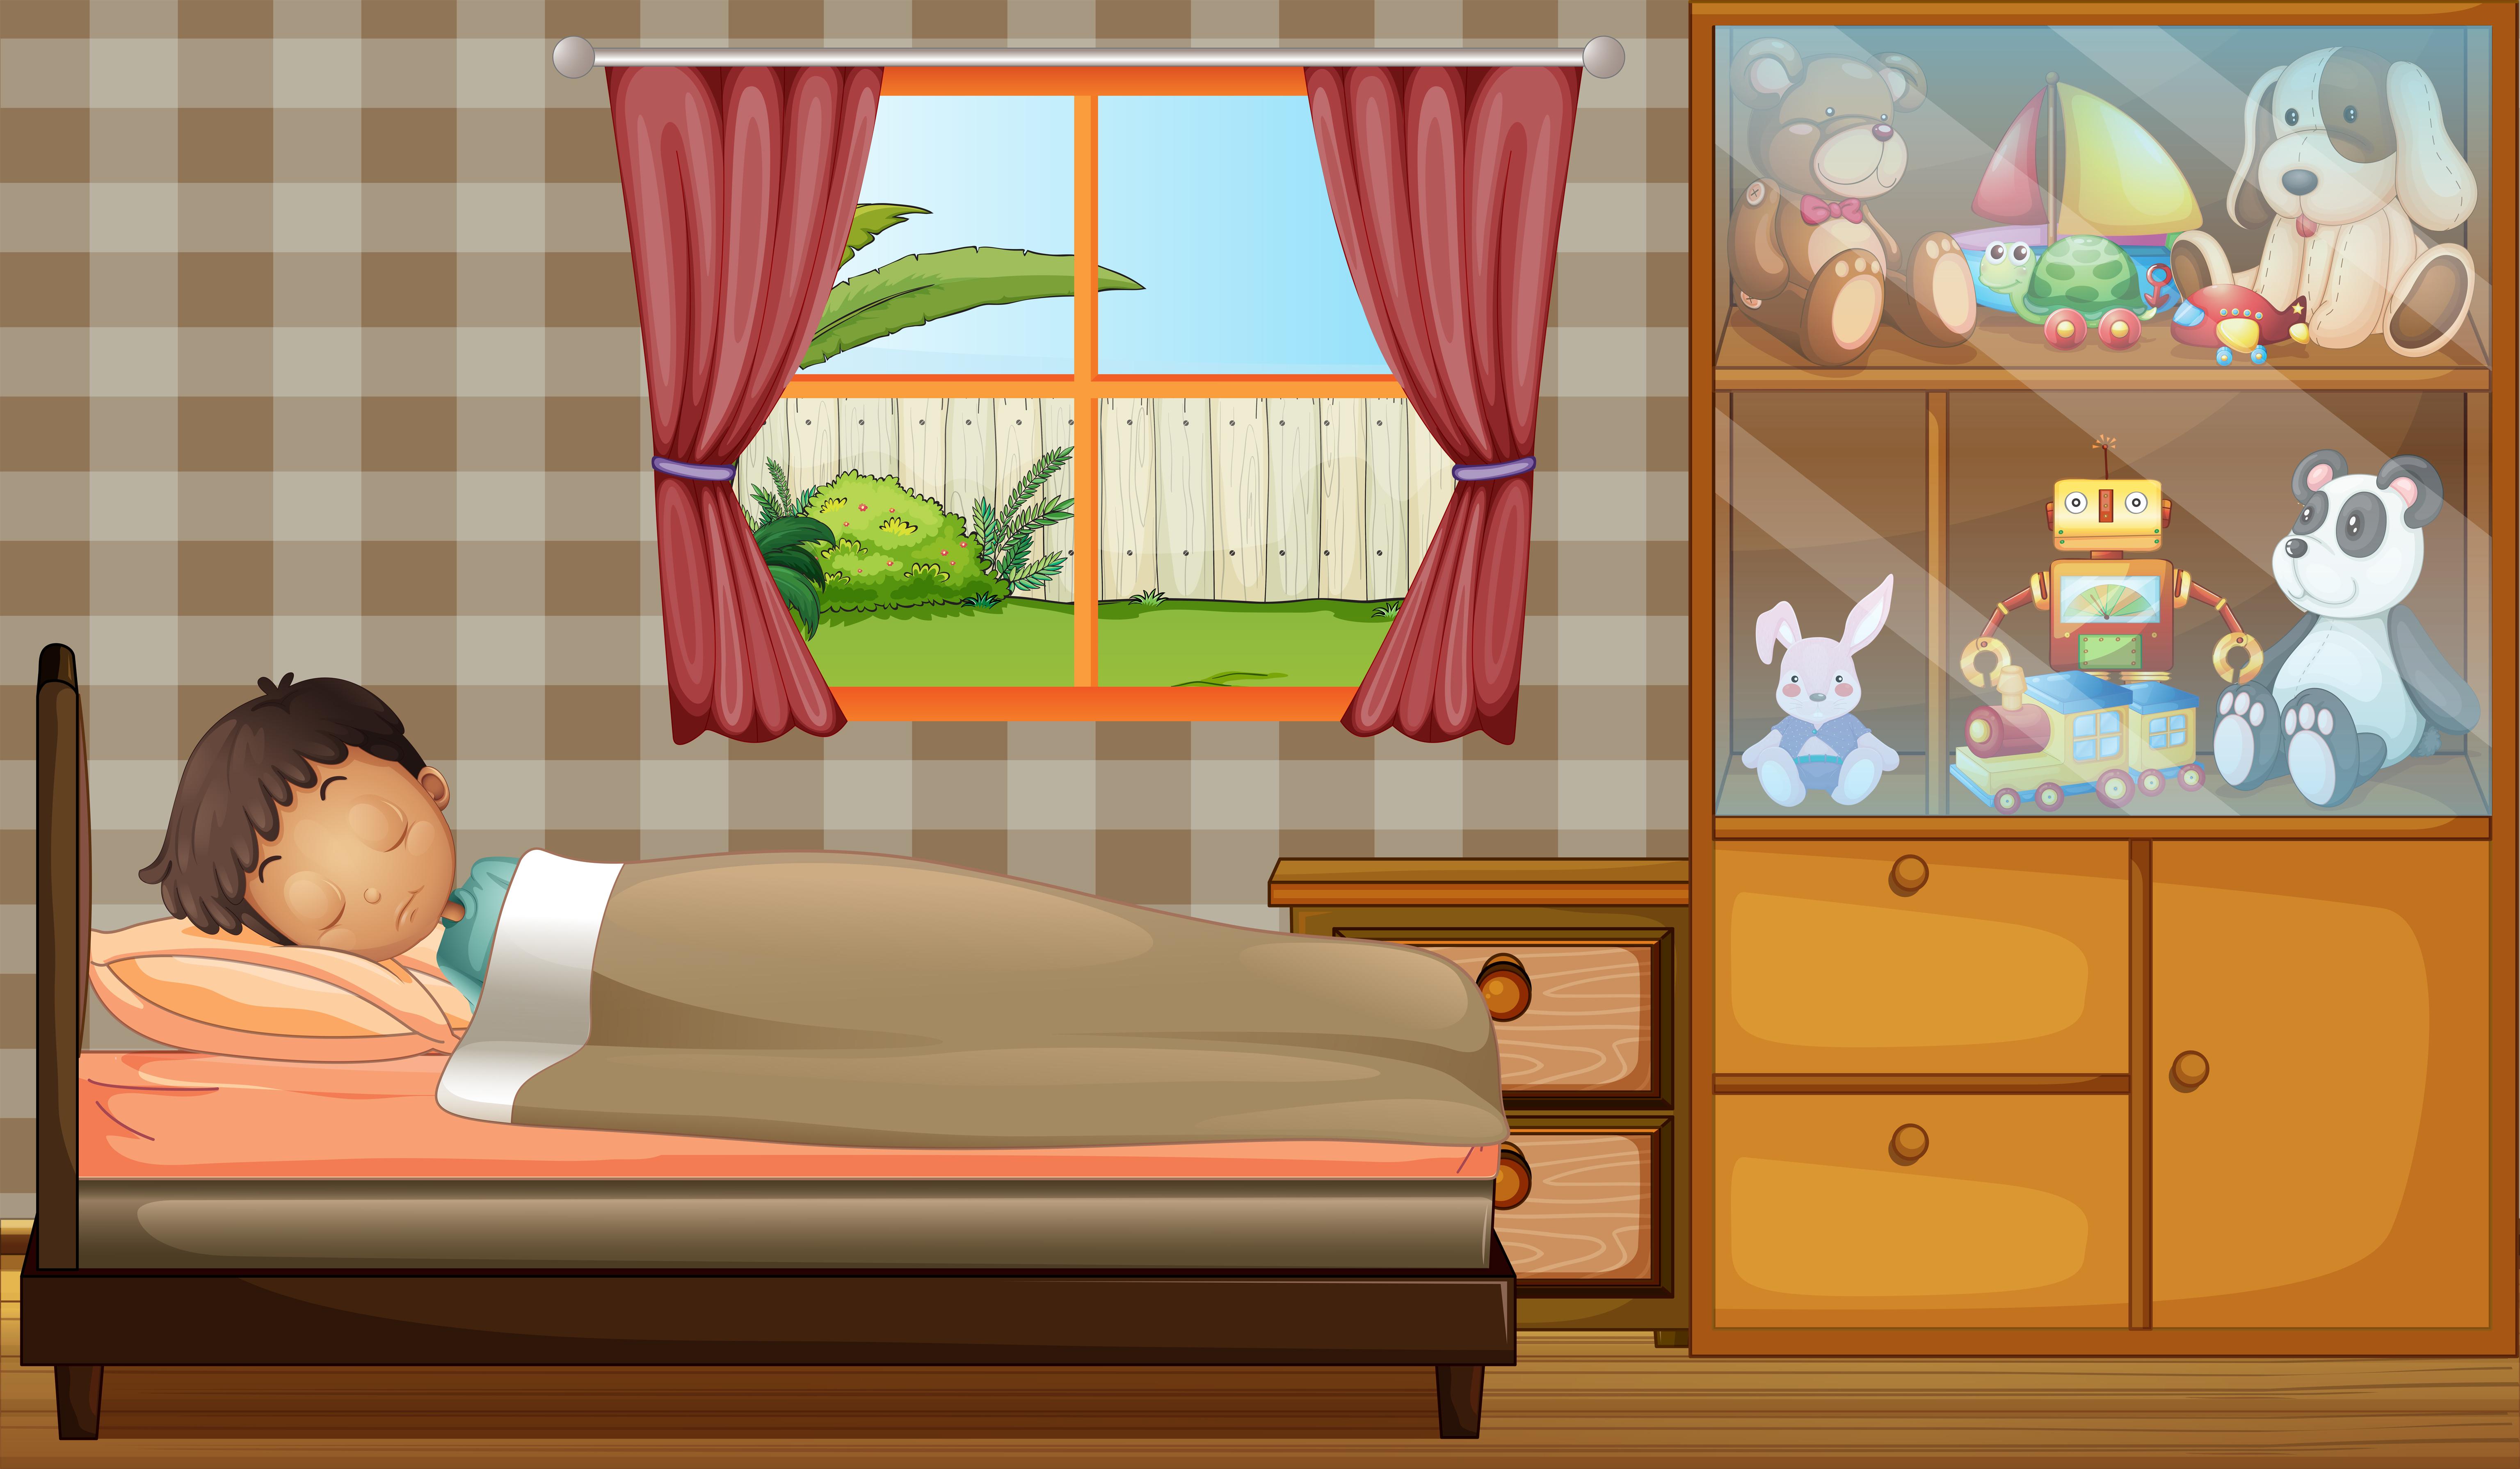 A boy sleeping in his bedroom - Download Free Vectors